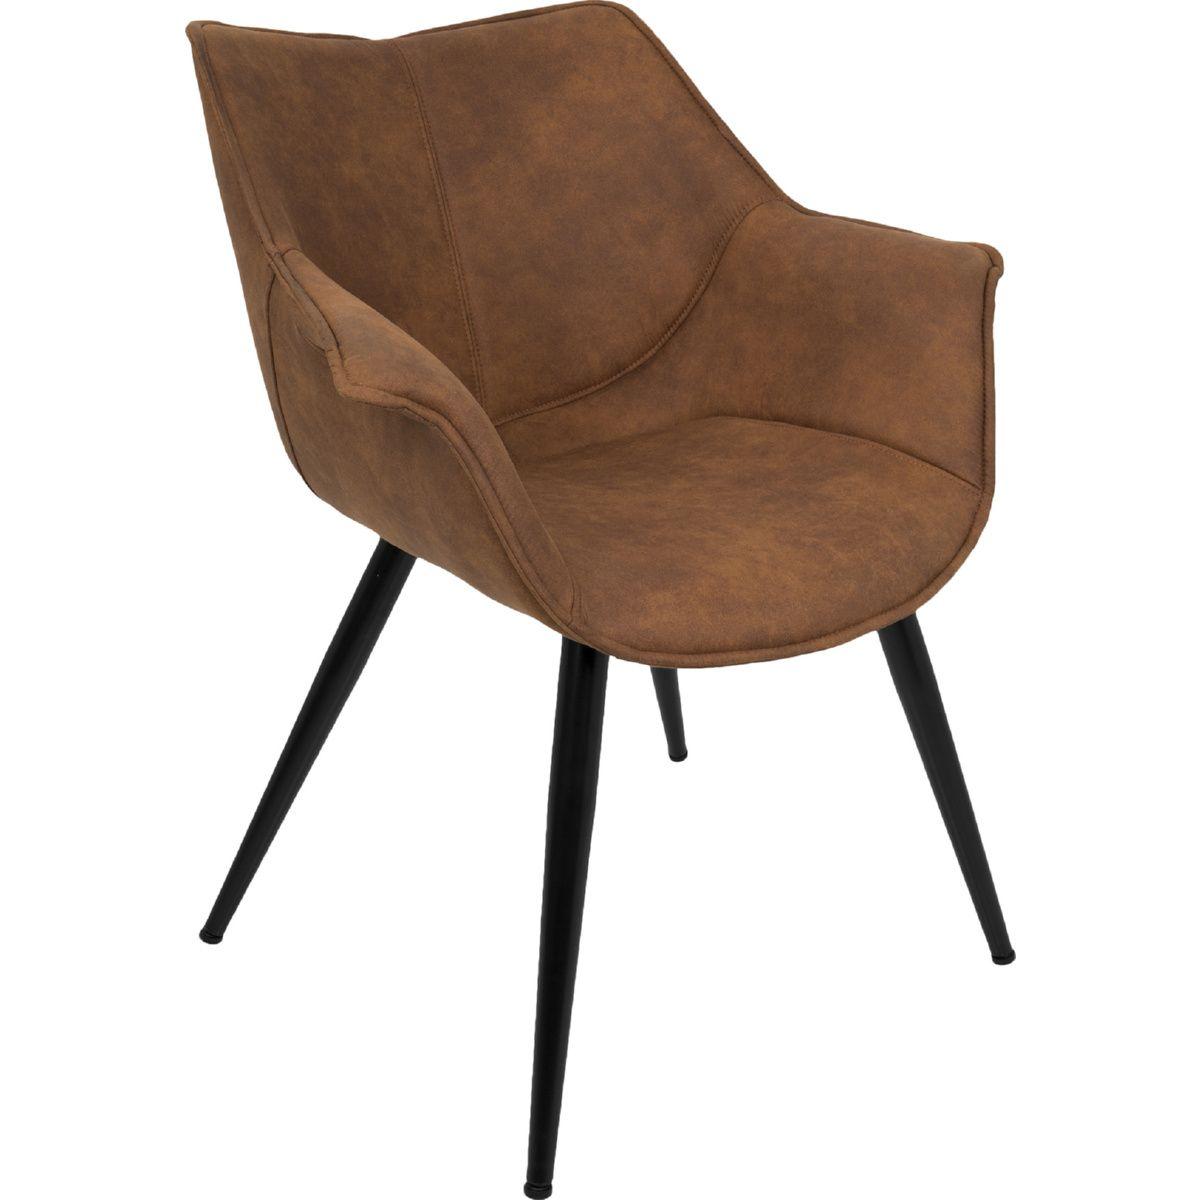 Best Lumisource Wrangler Accent Chair Rust Fabric Metal Legs 640 x 480